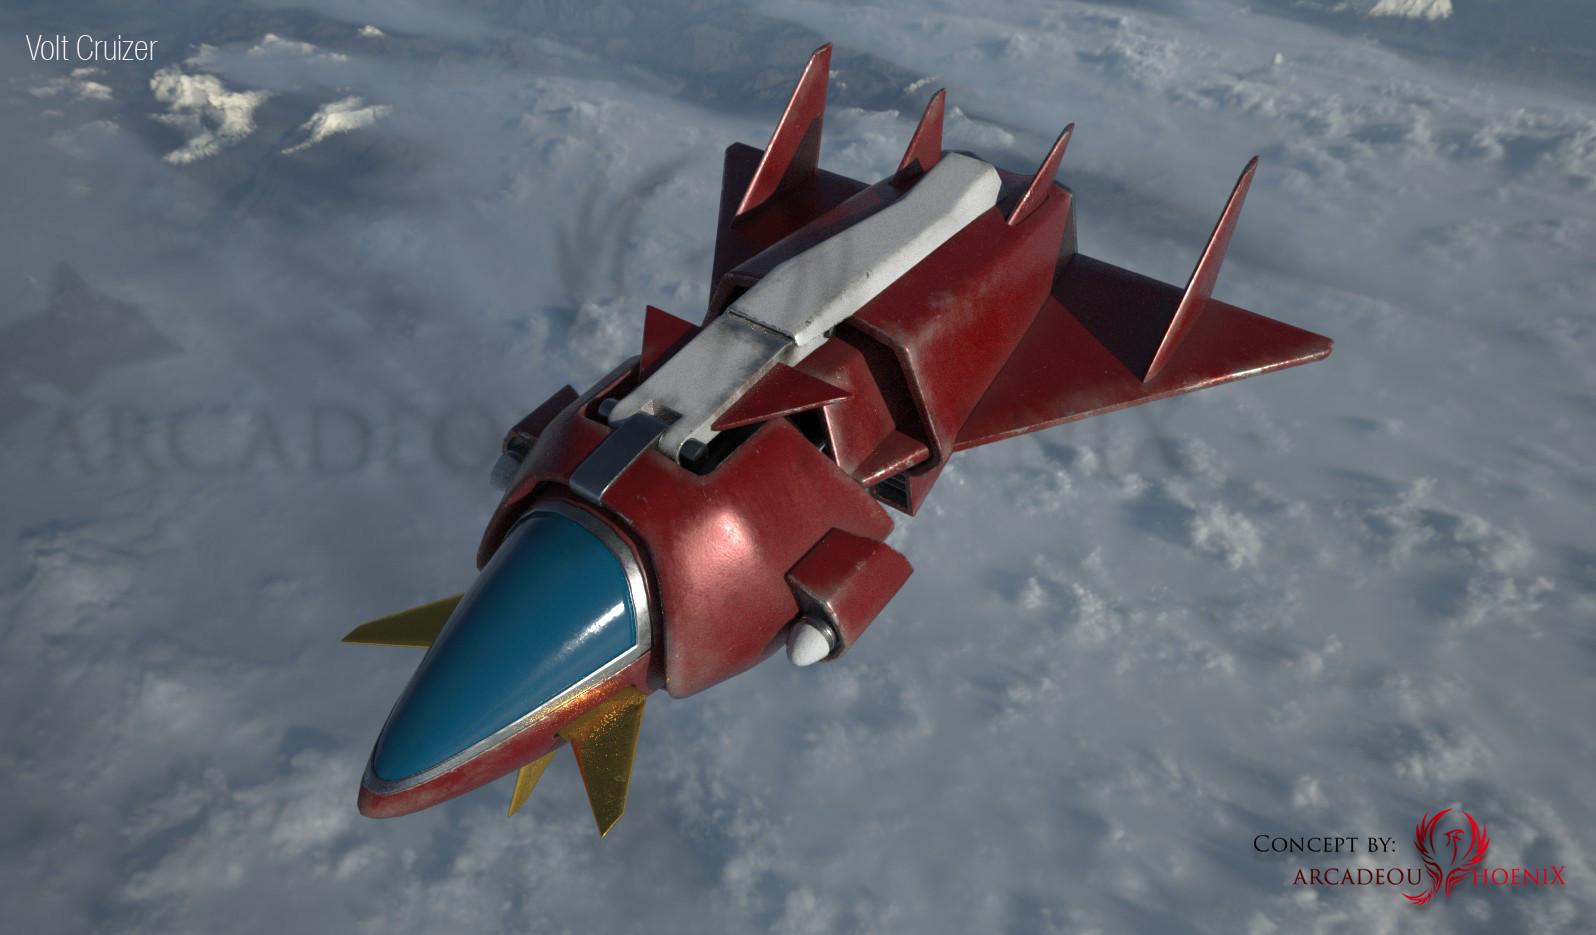 Arcadeous phoenix volt cruiser cam1